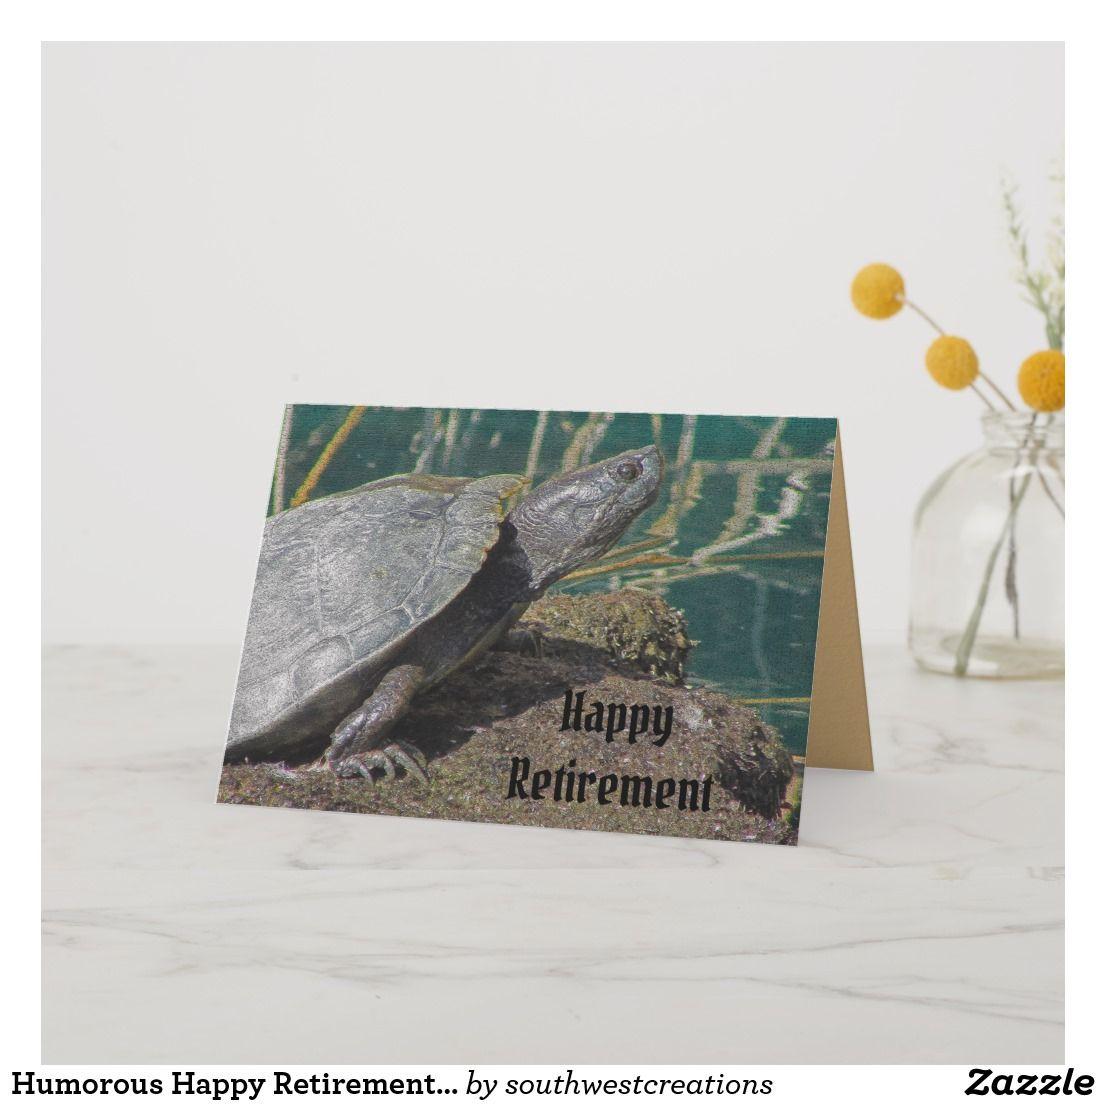 Happy Retirement Humorous Turtle Speed Enjoy Life Card